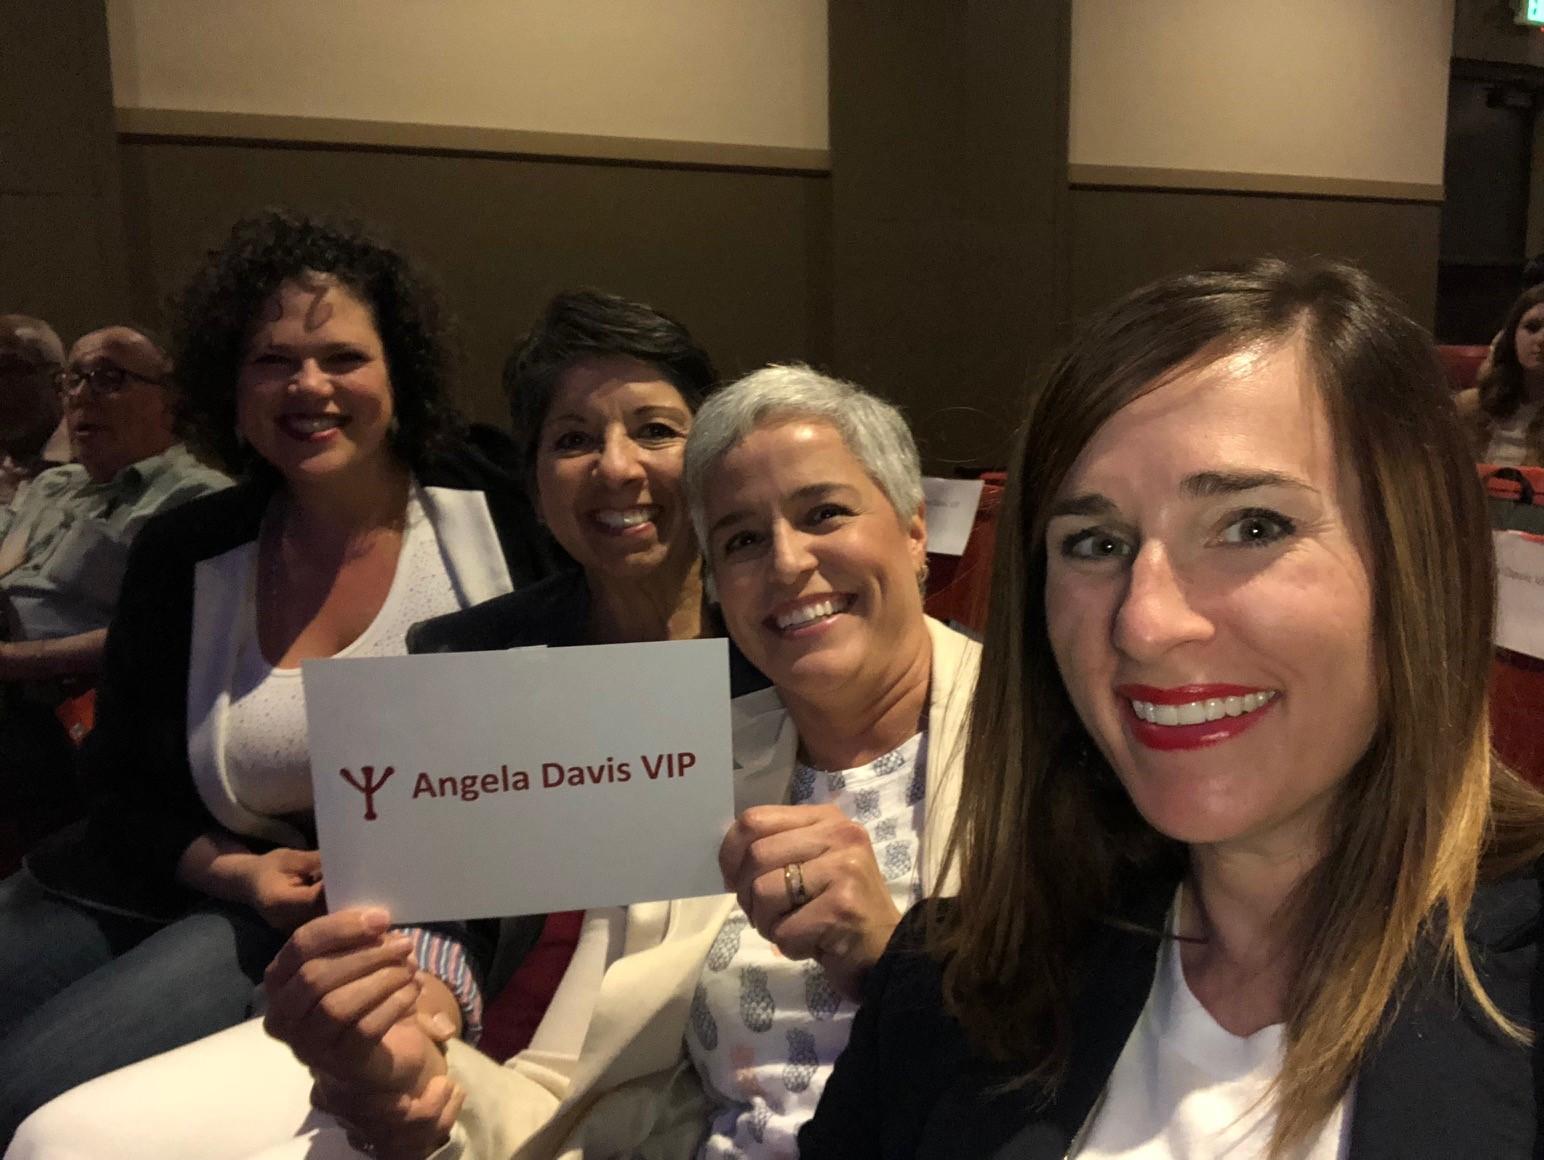 Friends of Angela Davis